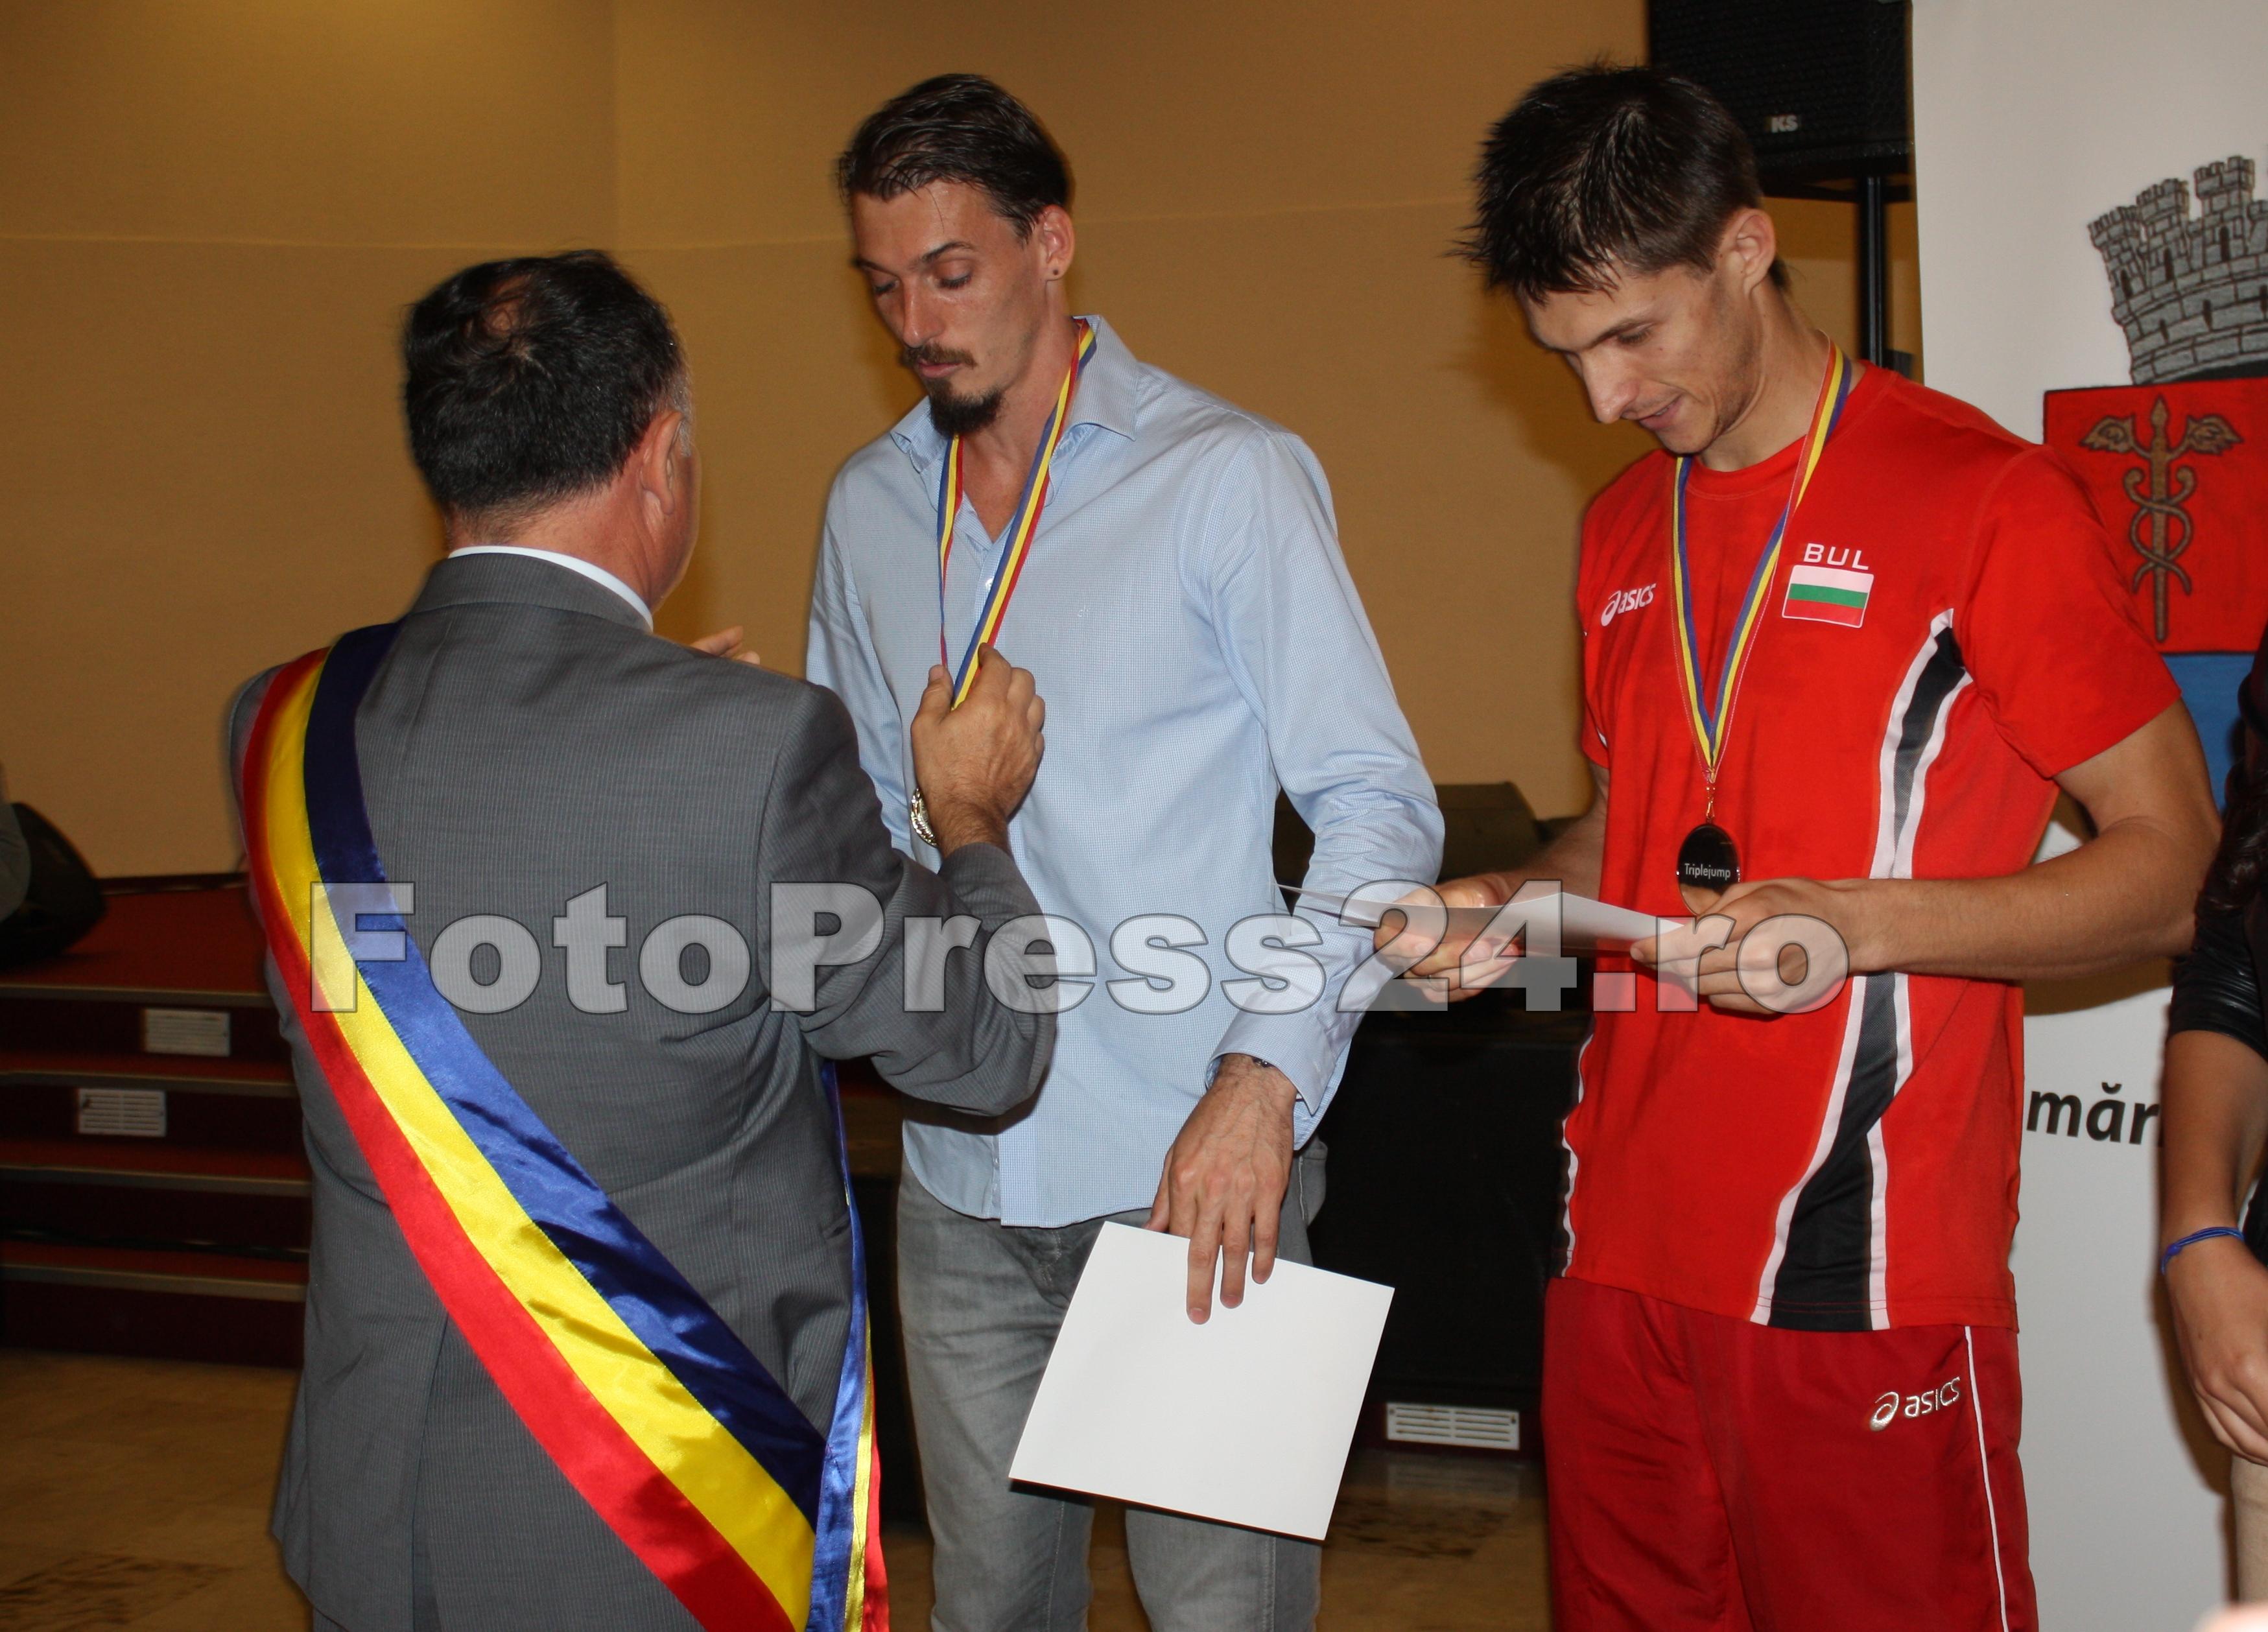 premiere_campionatul_balcanic-foropress24 (5)